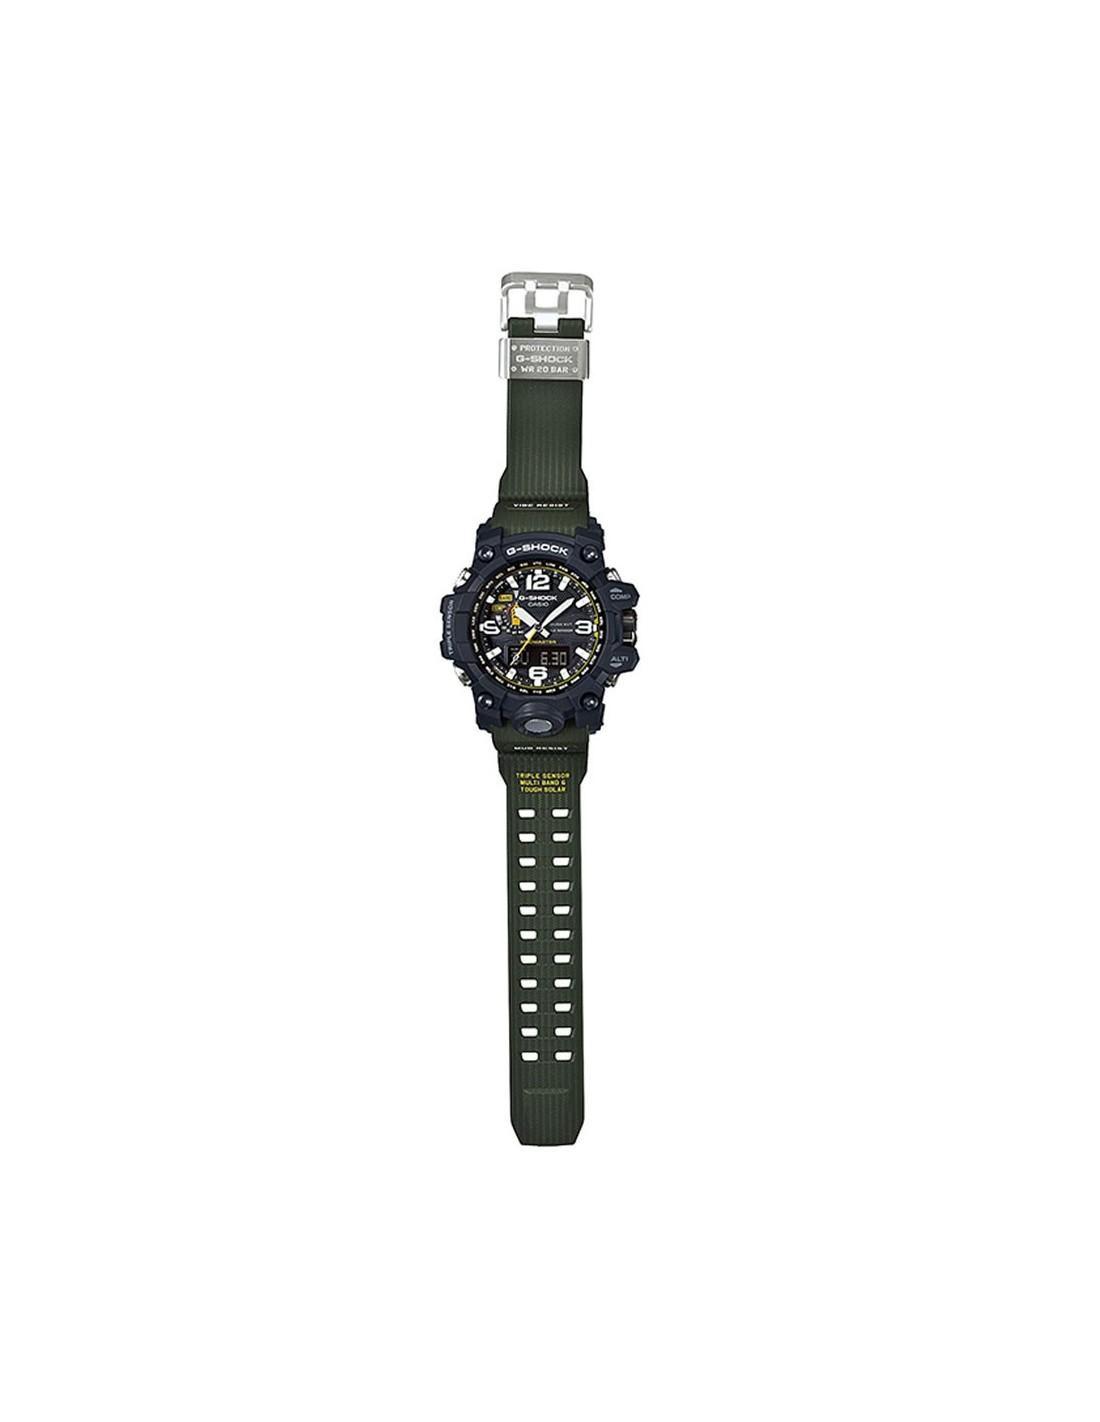 028fea58cf3 ... Relógio Casio G-Shock MUDMASTER GWG-1000-1A3ER ...